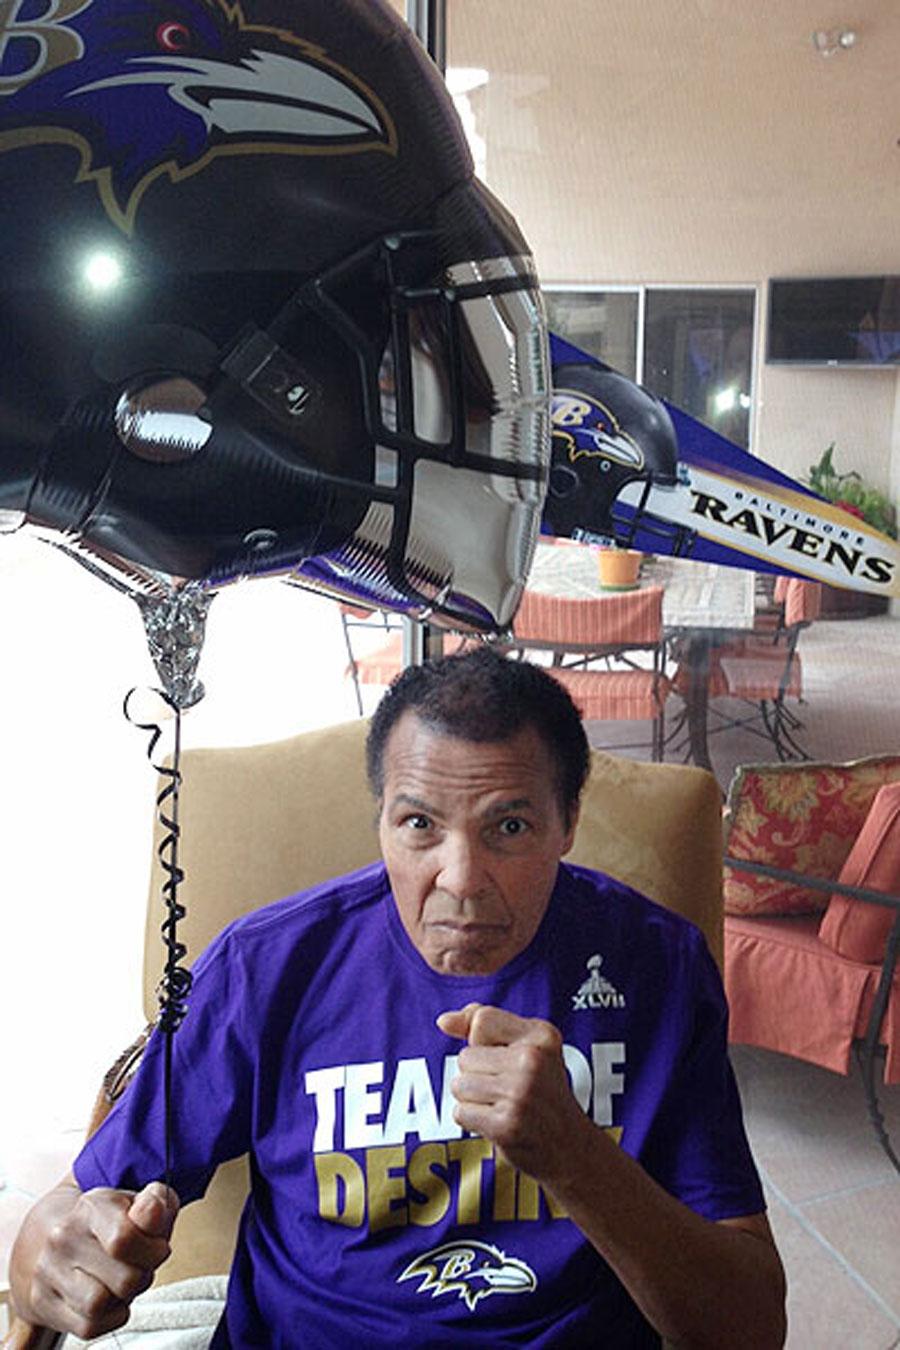 Мухаммед Али болеет в супер-финале NFL за Baltimore Ravens